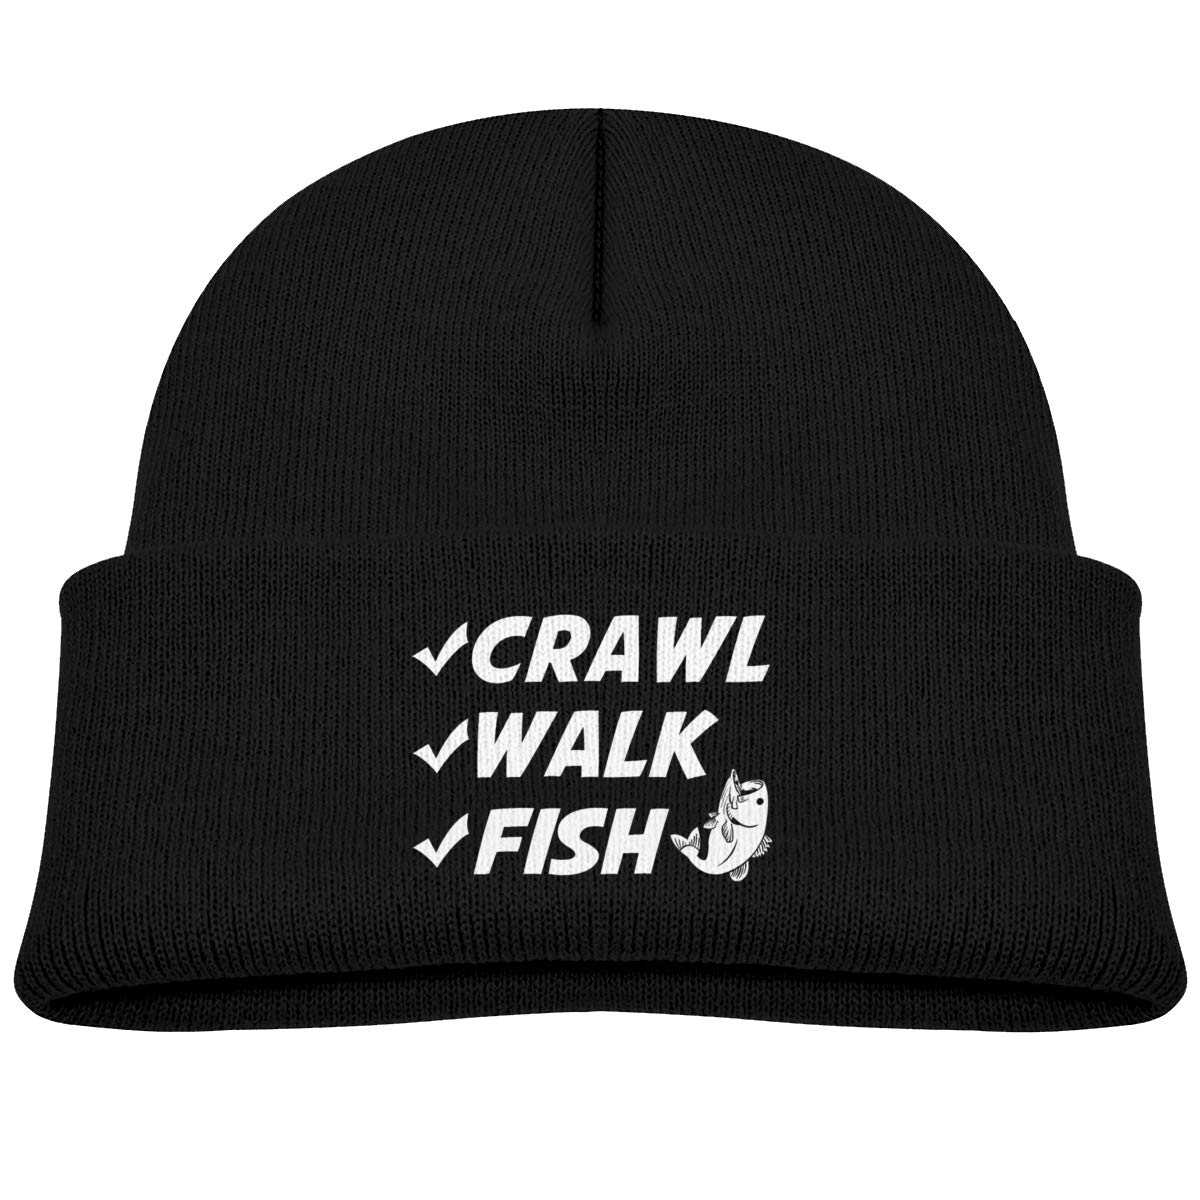 Moniery Crawl Walk Fish Beanie Caps Baby Boy